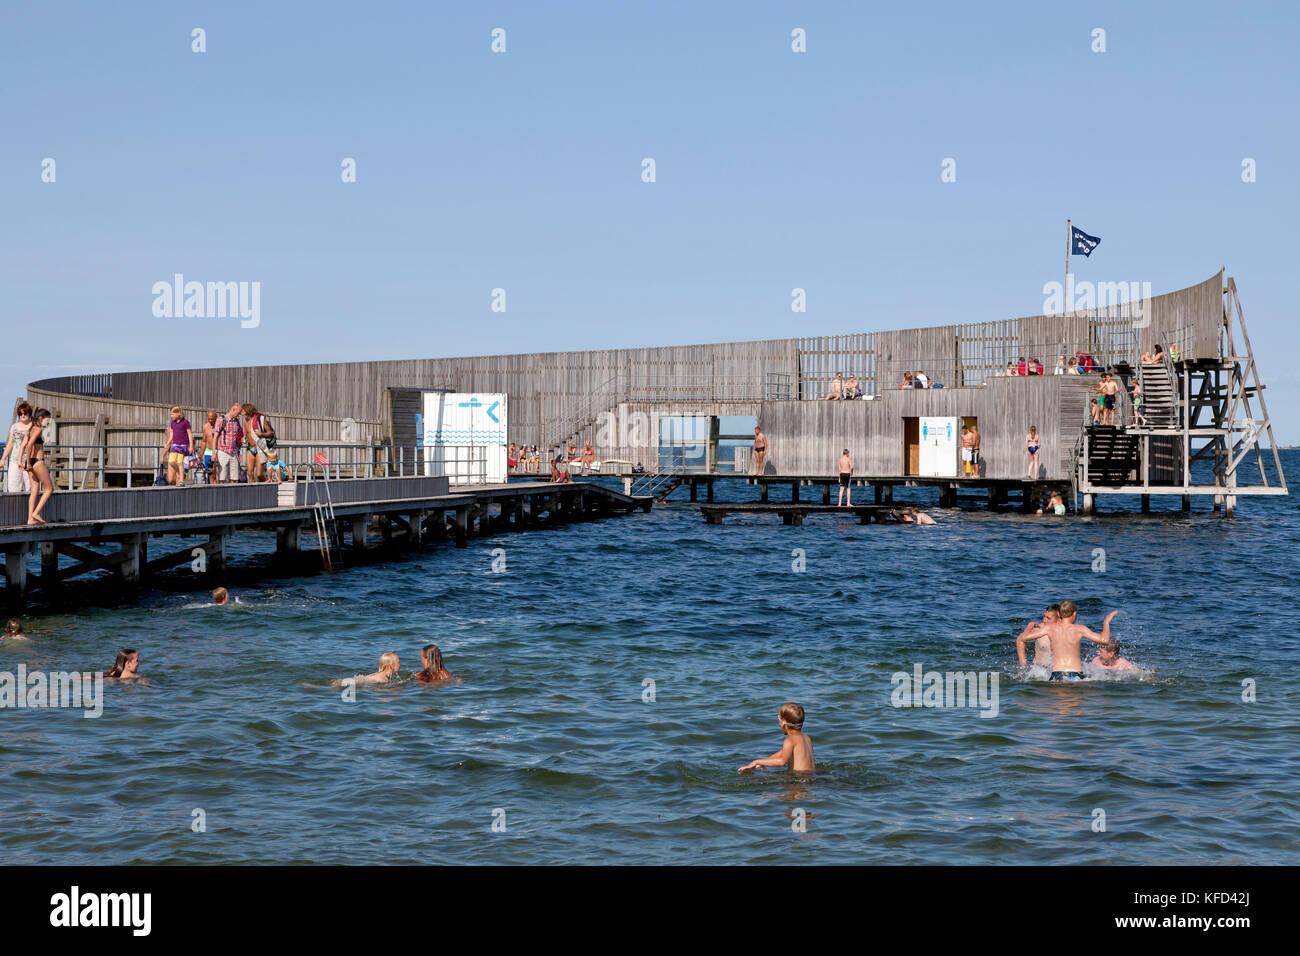 Kastrup Søbad, Sneglen, Kastrup Public Baths, the Snail, on Amager, Copenhagen.  Architect designed bathing - Stock Image